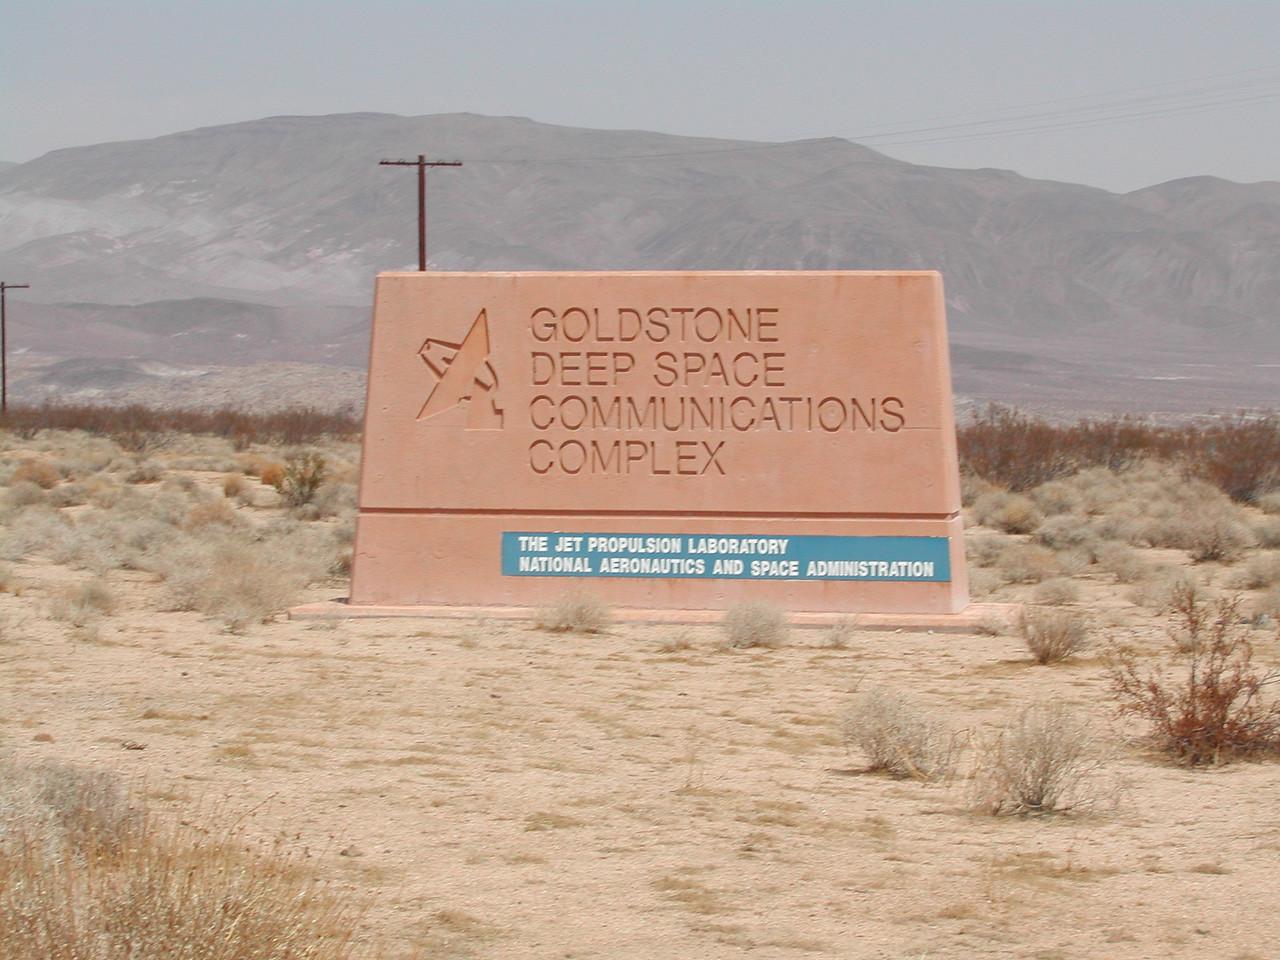 Goldstone CA: GSSR